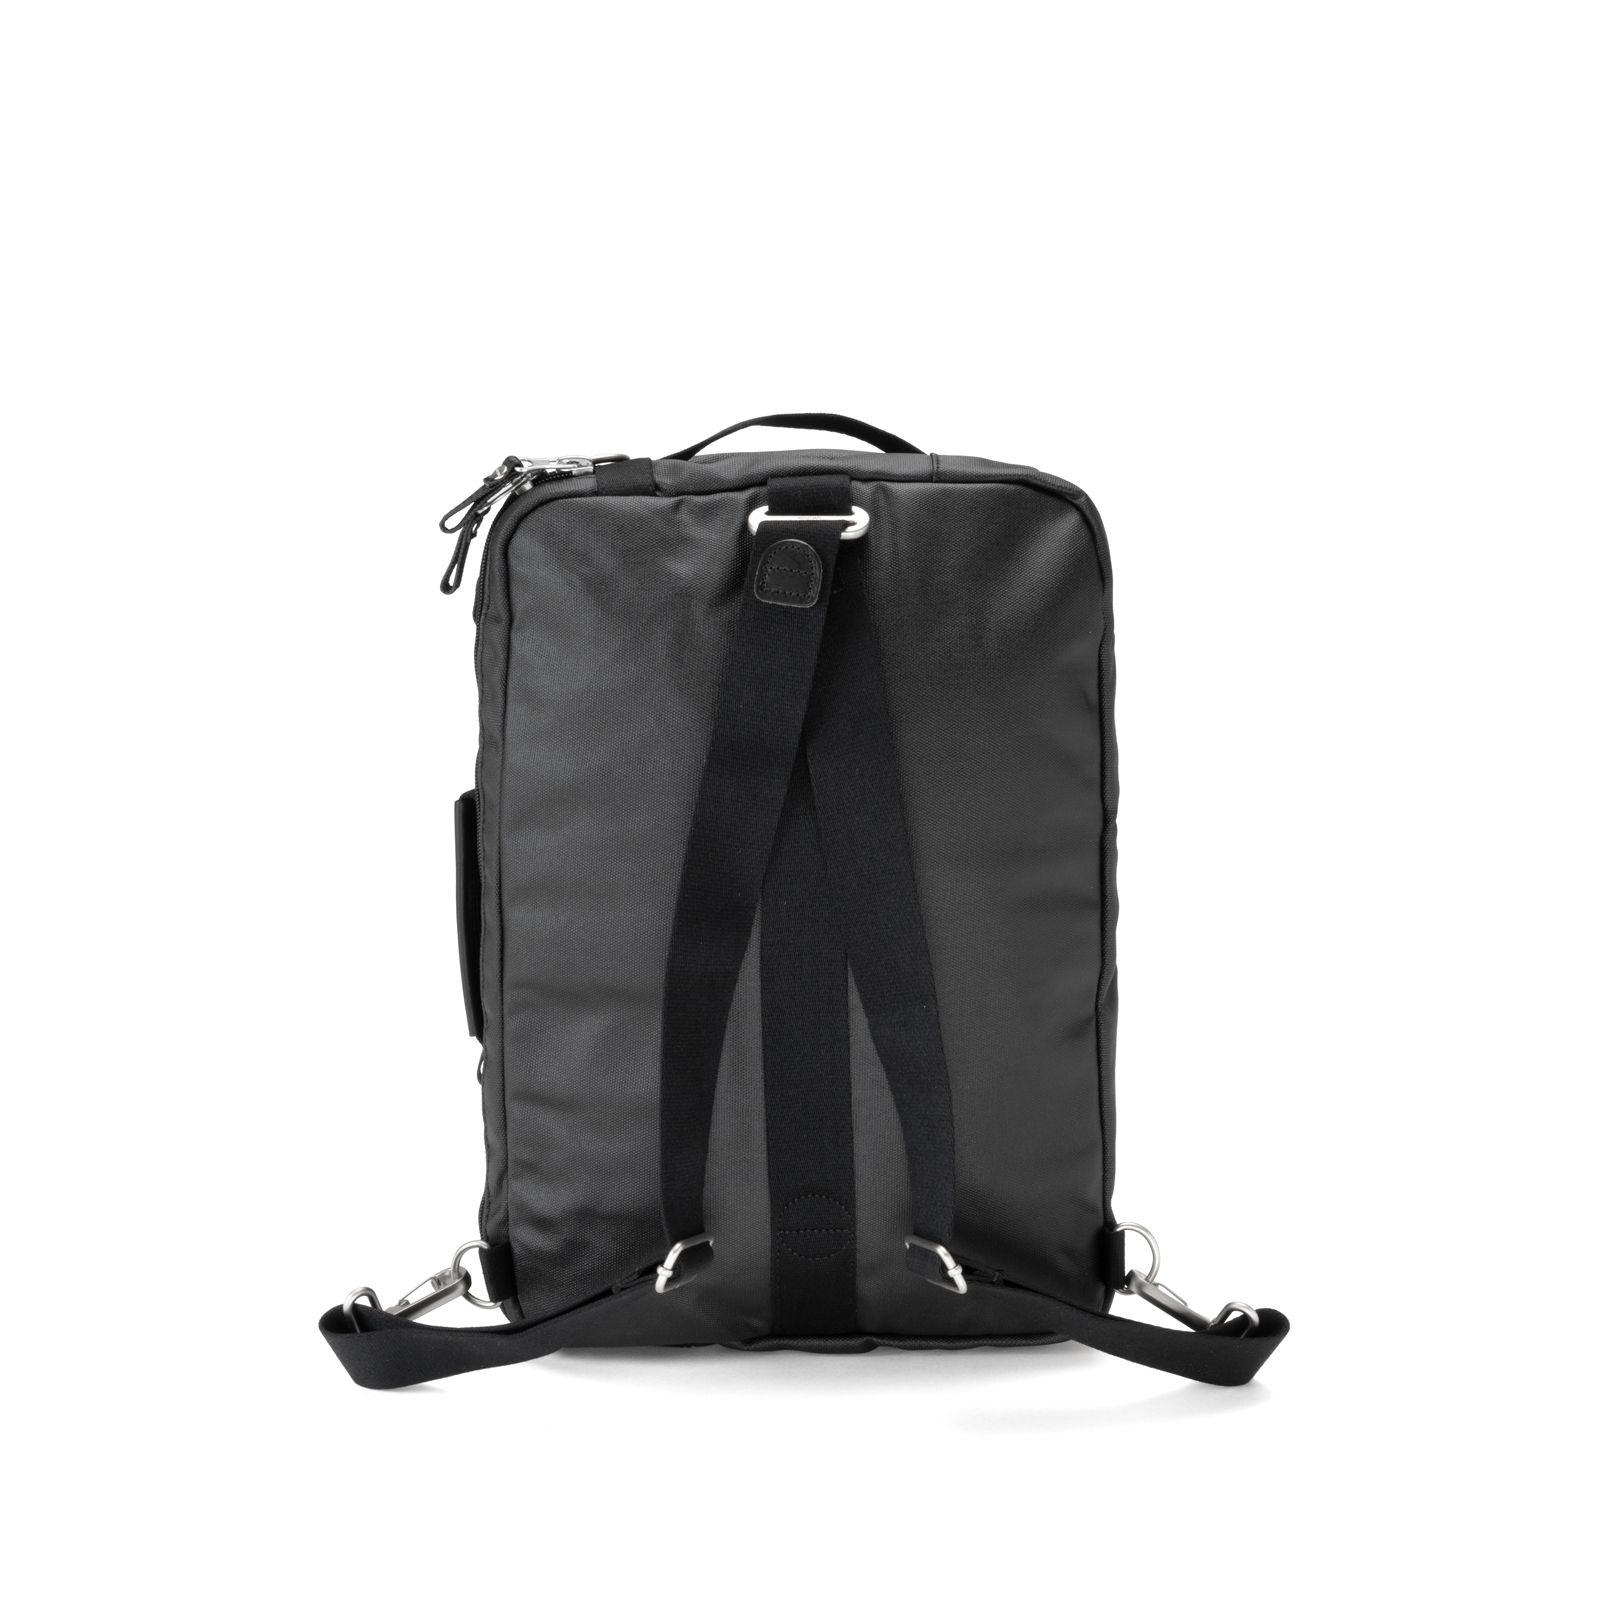 Simple Office - Organic Jet Black